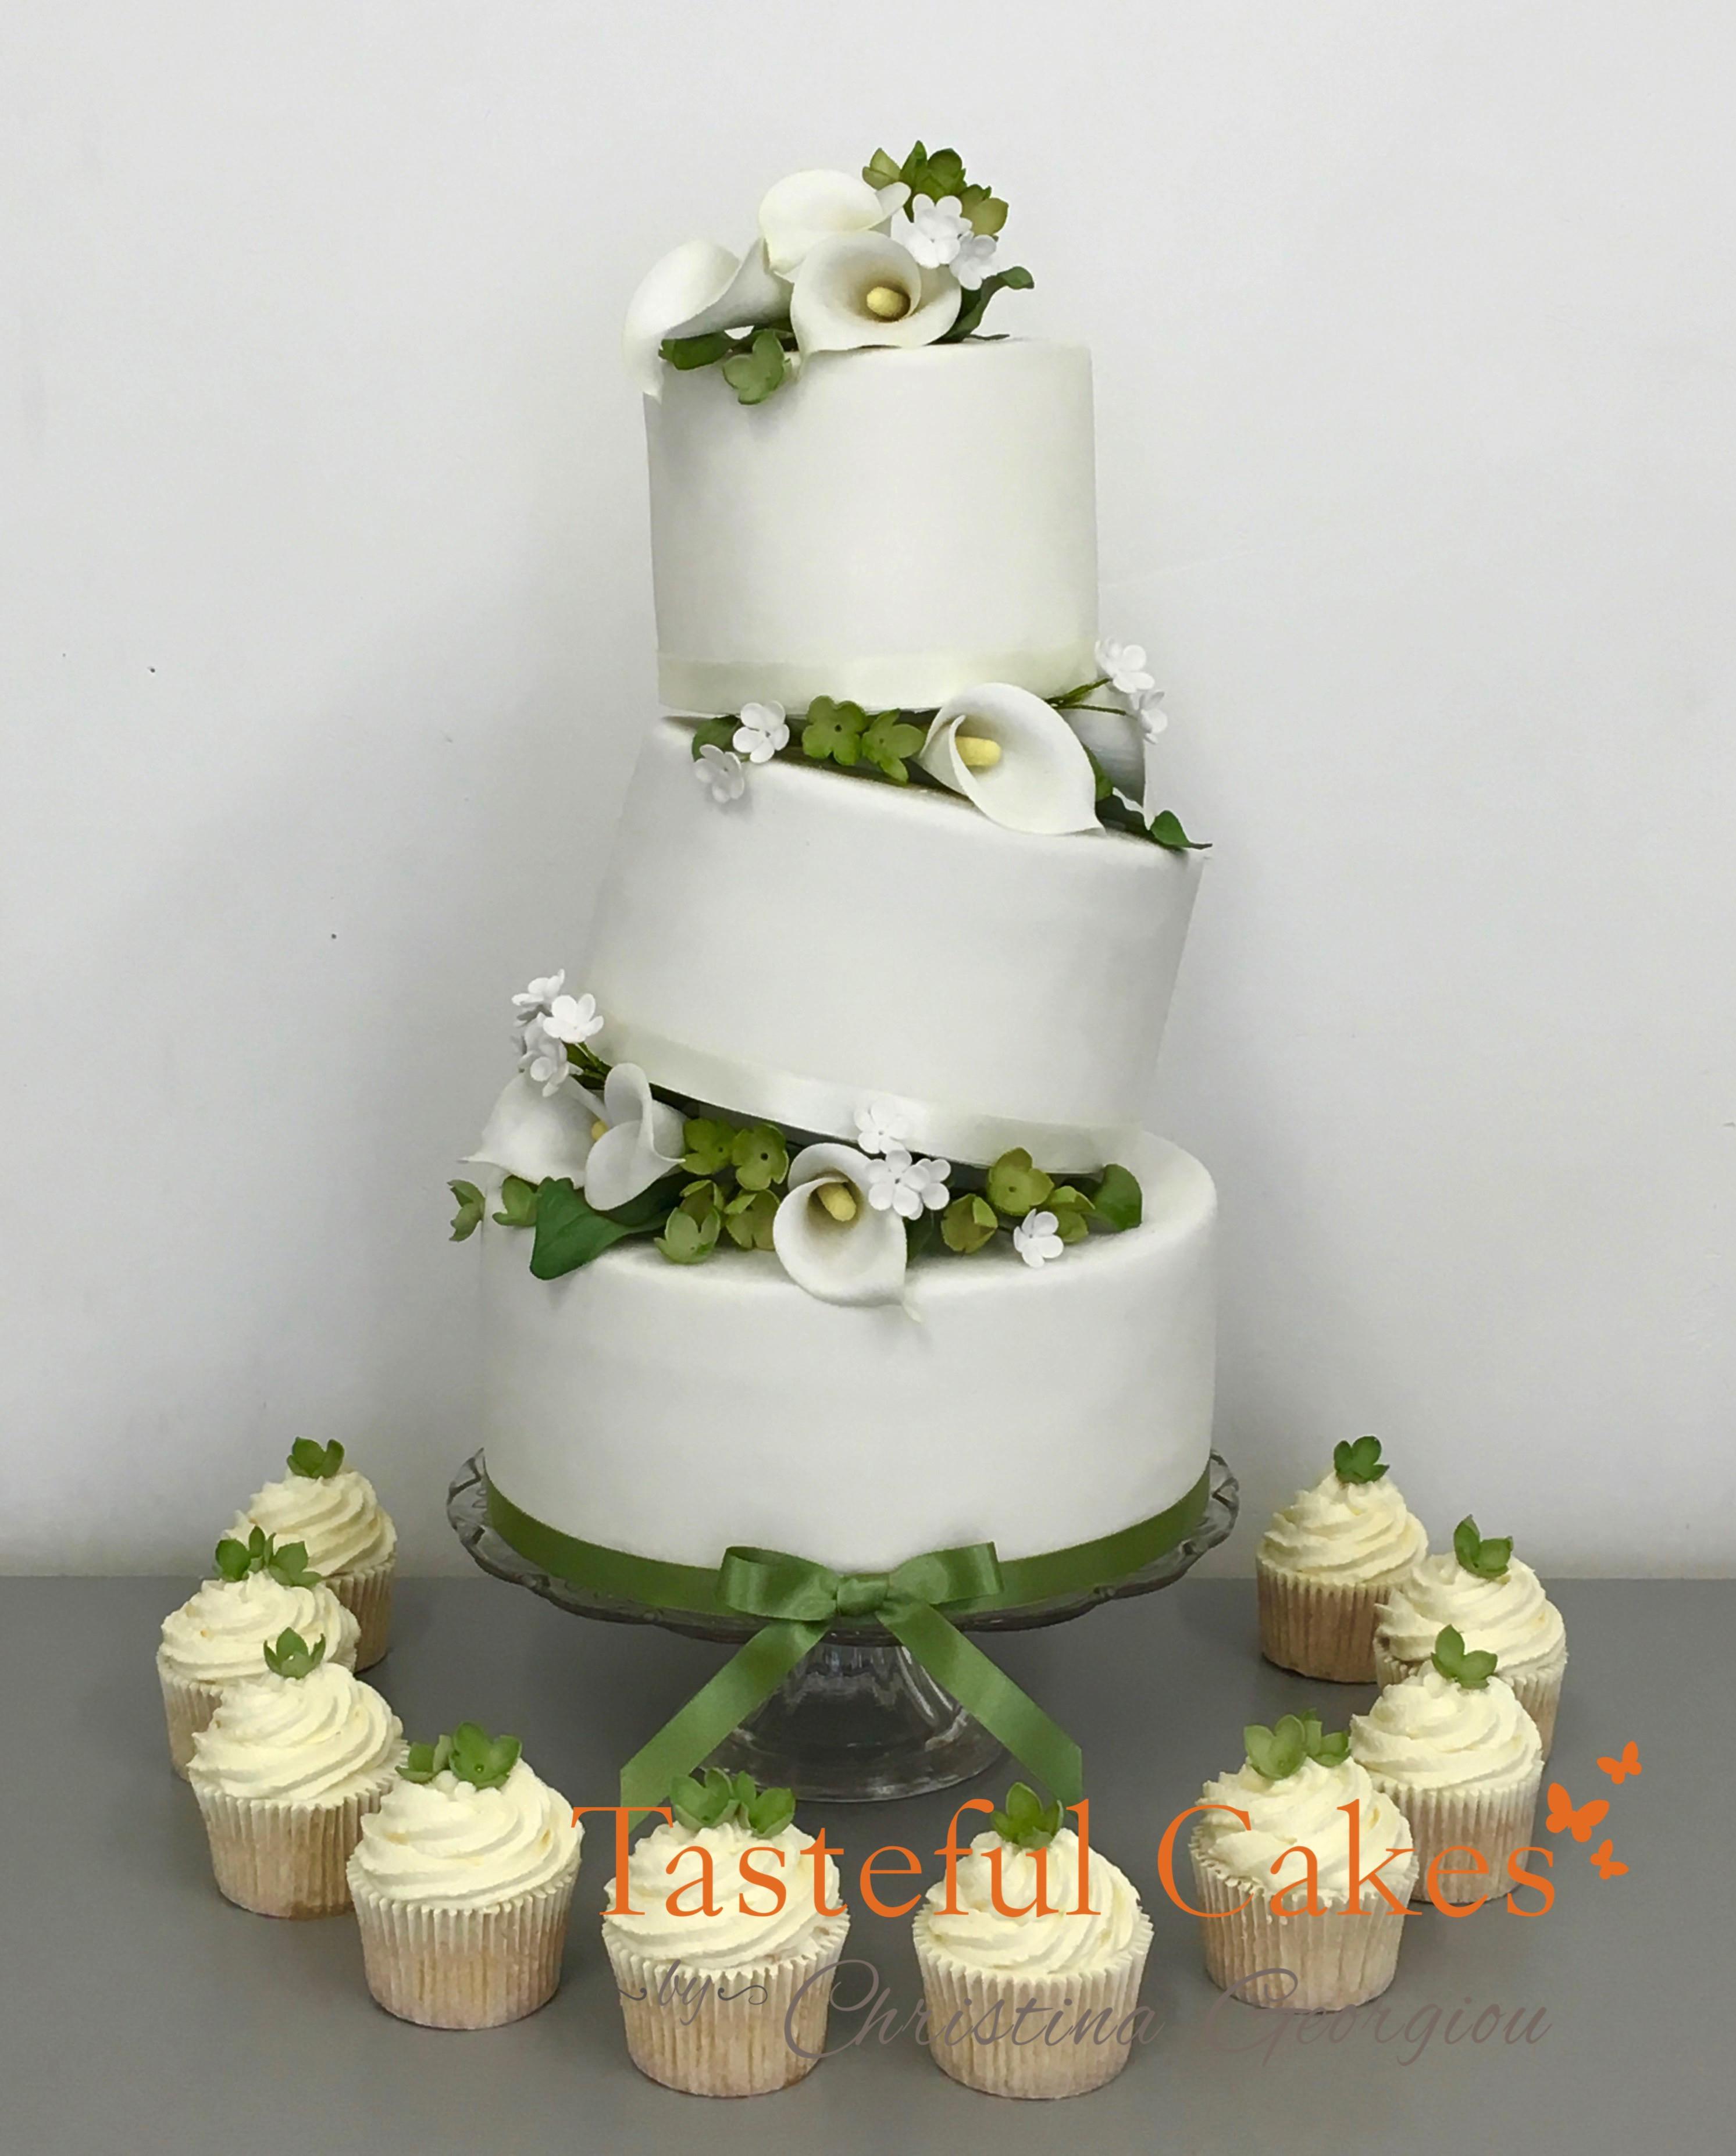 Green Wedding Cakes  Tasteful Cakes By Christina Georgiou